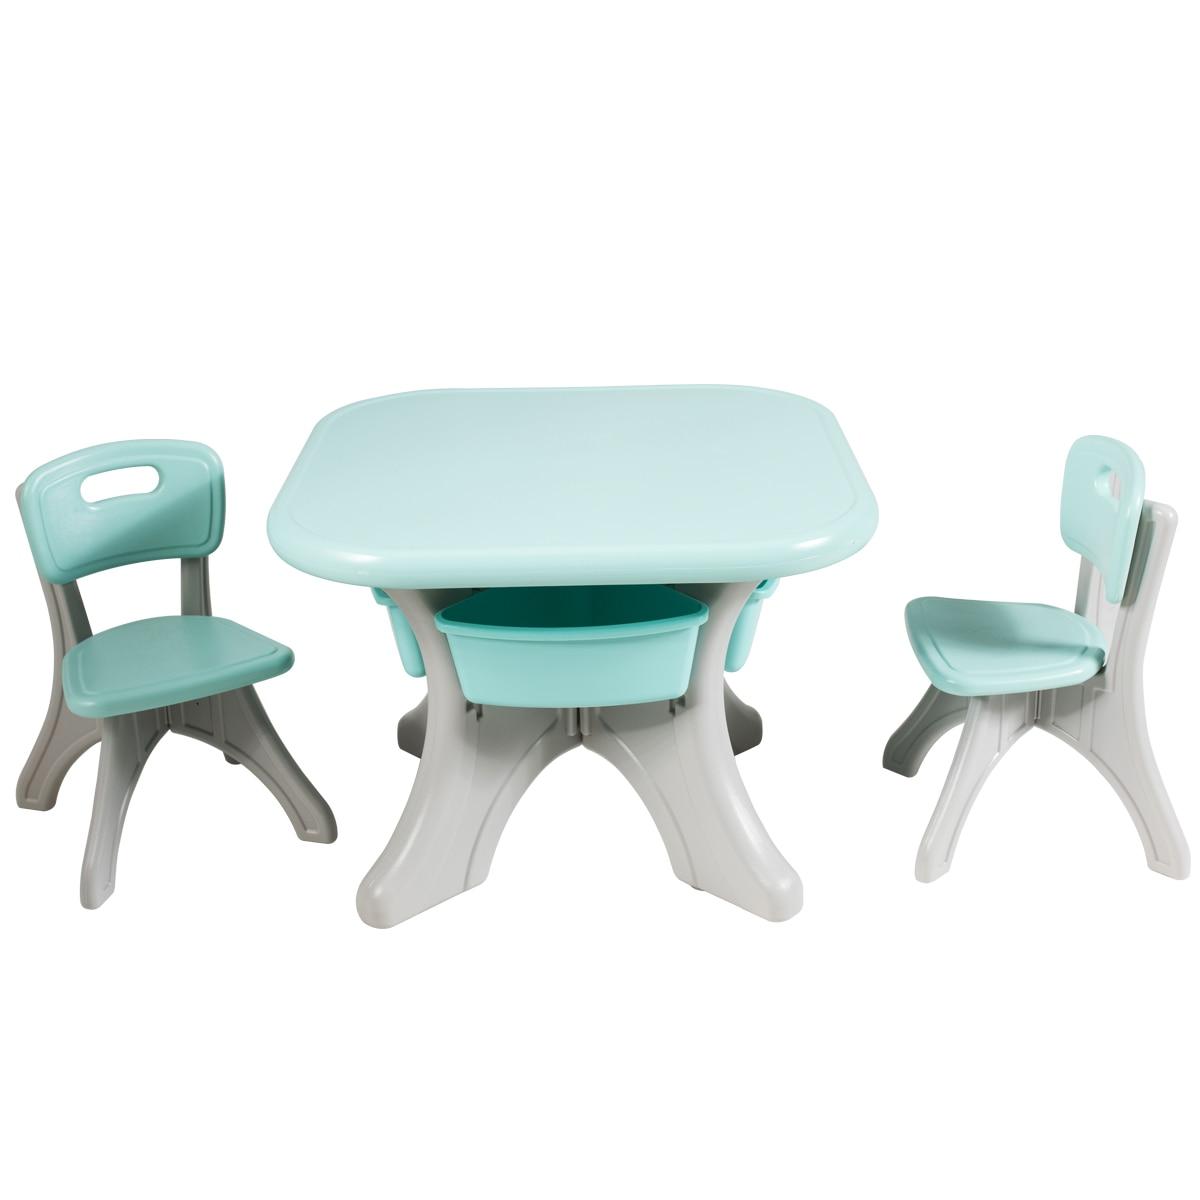 Children Kids Activity Table Chair Set Play Furniture W Storage Garden Indoor Baby Seats Sofa Aliexpress